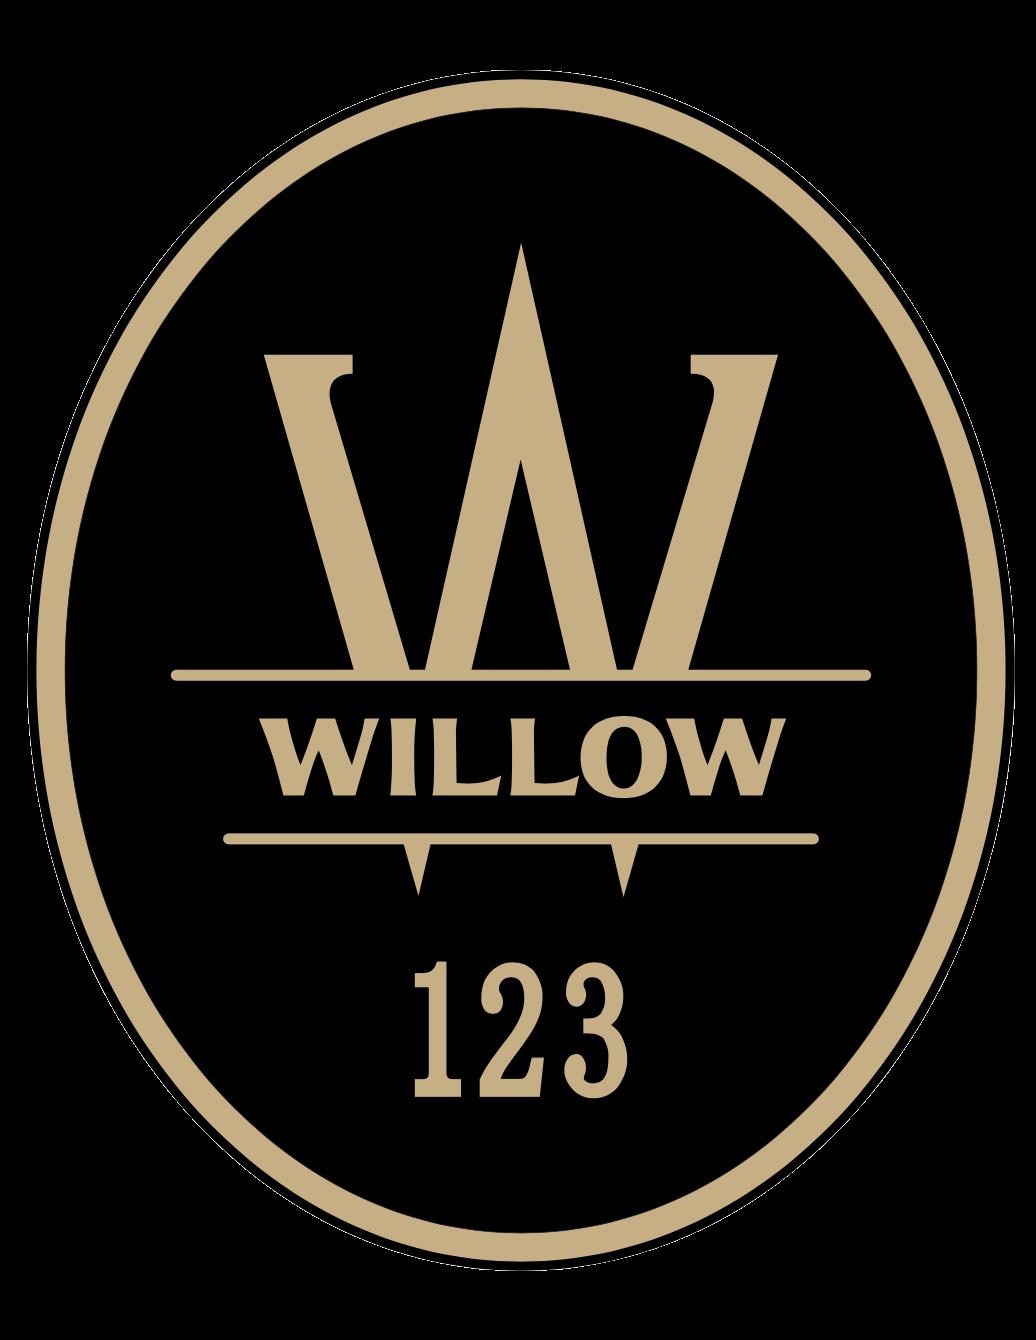 Willow 123 Lofts